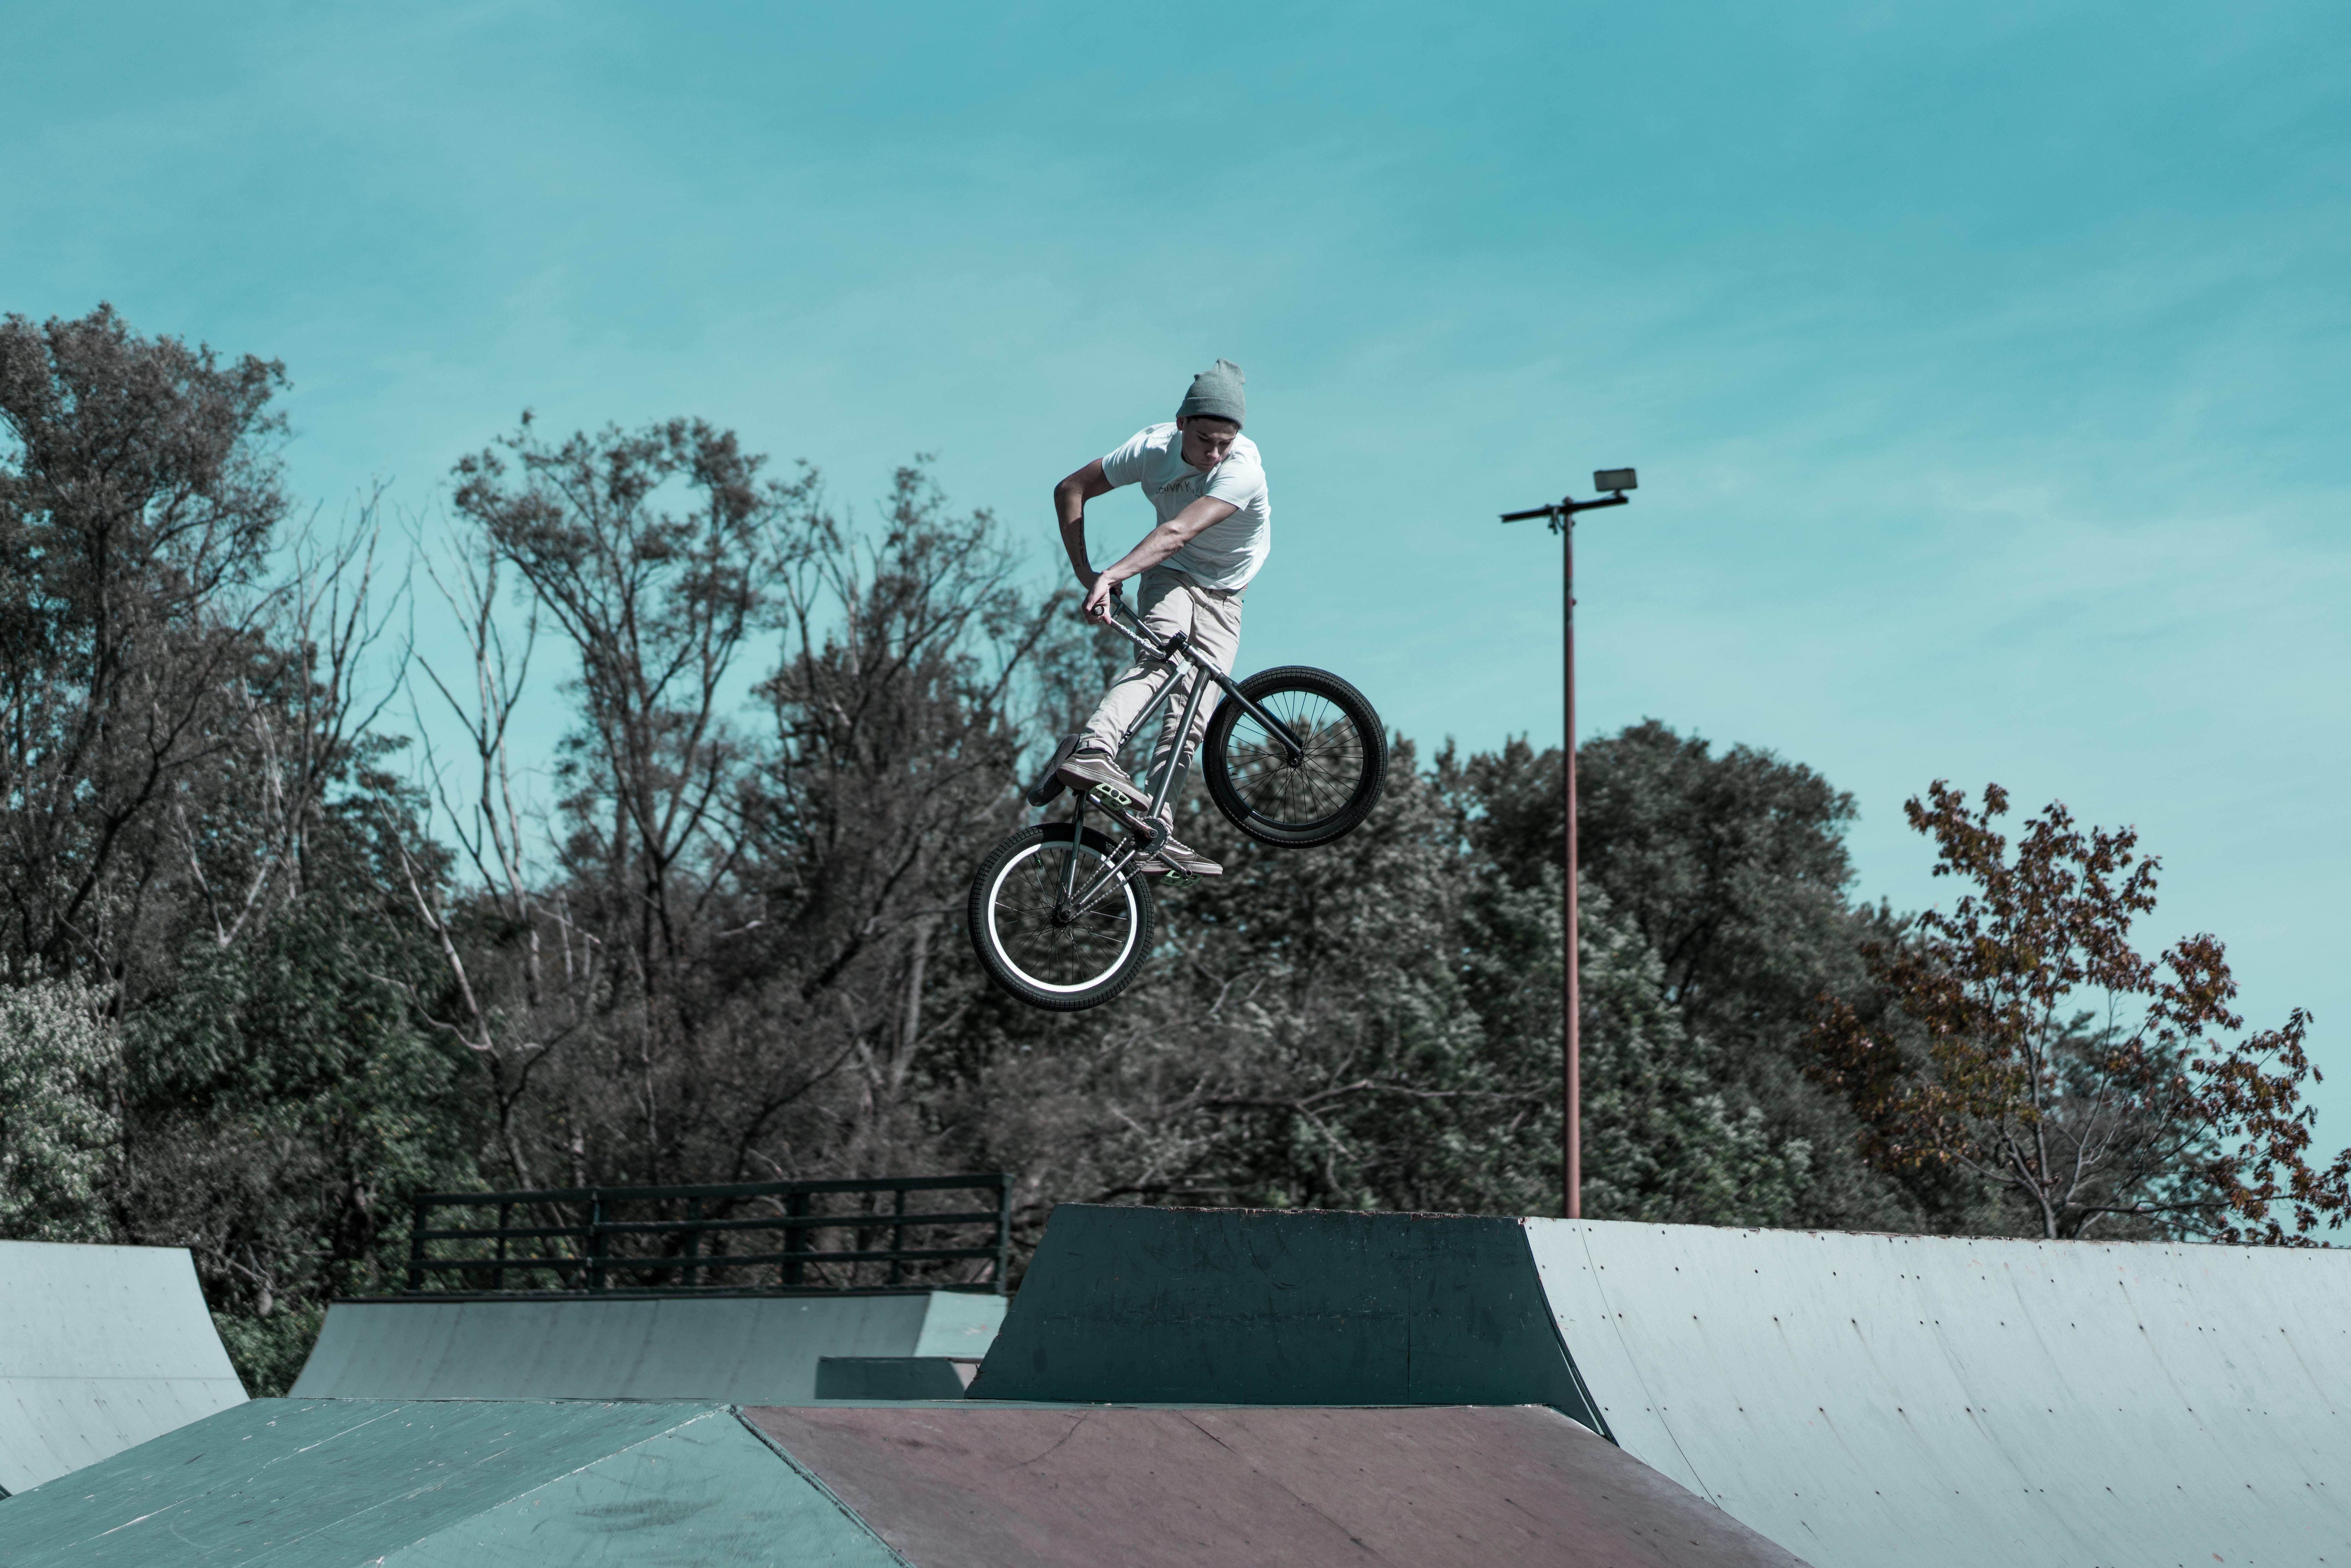 man riding bike performed trick above ramp